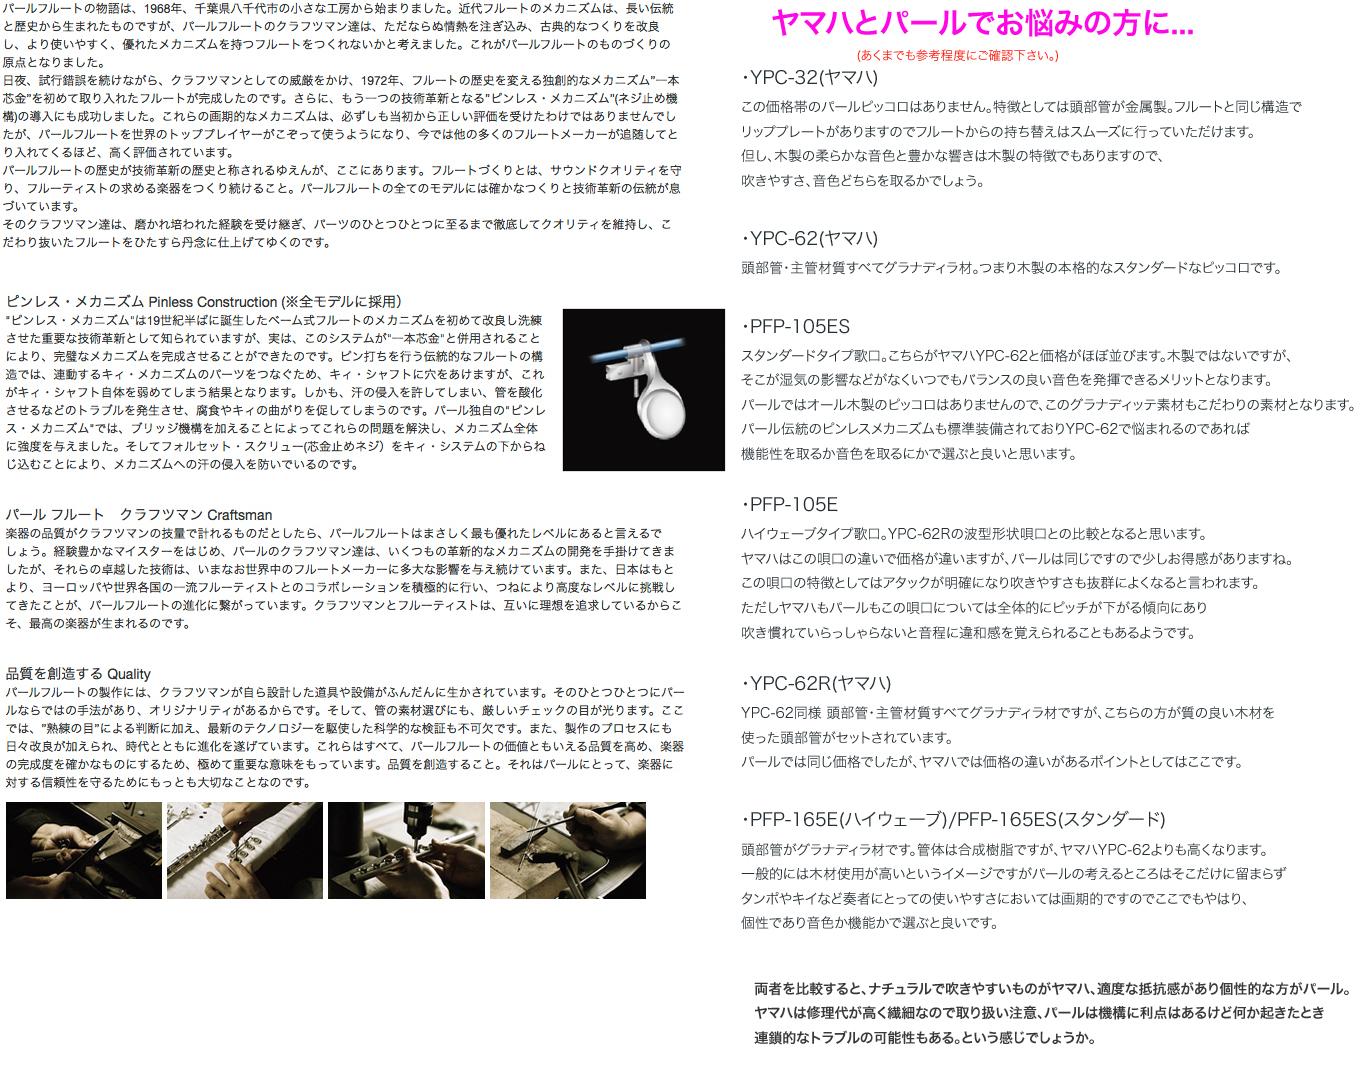 Pearl Flute ( パールフルート ) PFP-165ES ピッコロ 木製頭部管 主管 グラナディッテ製 スタンダード歌口 頭部管 グラナディラ 管体 樹脂製 Eメカ PFP165ES セット D 送料無料